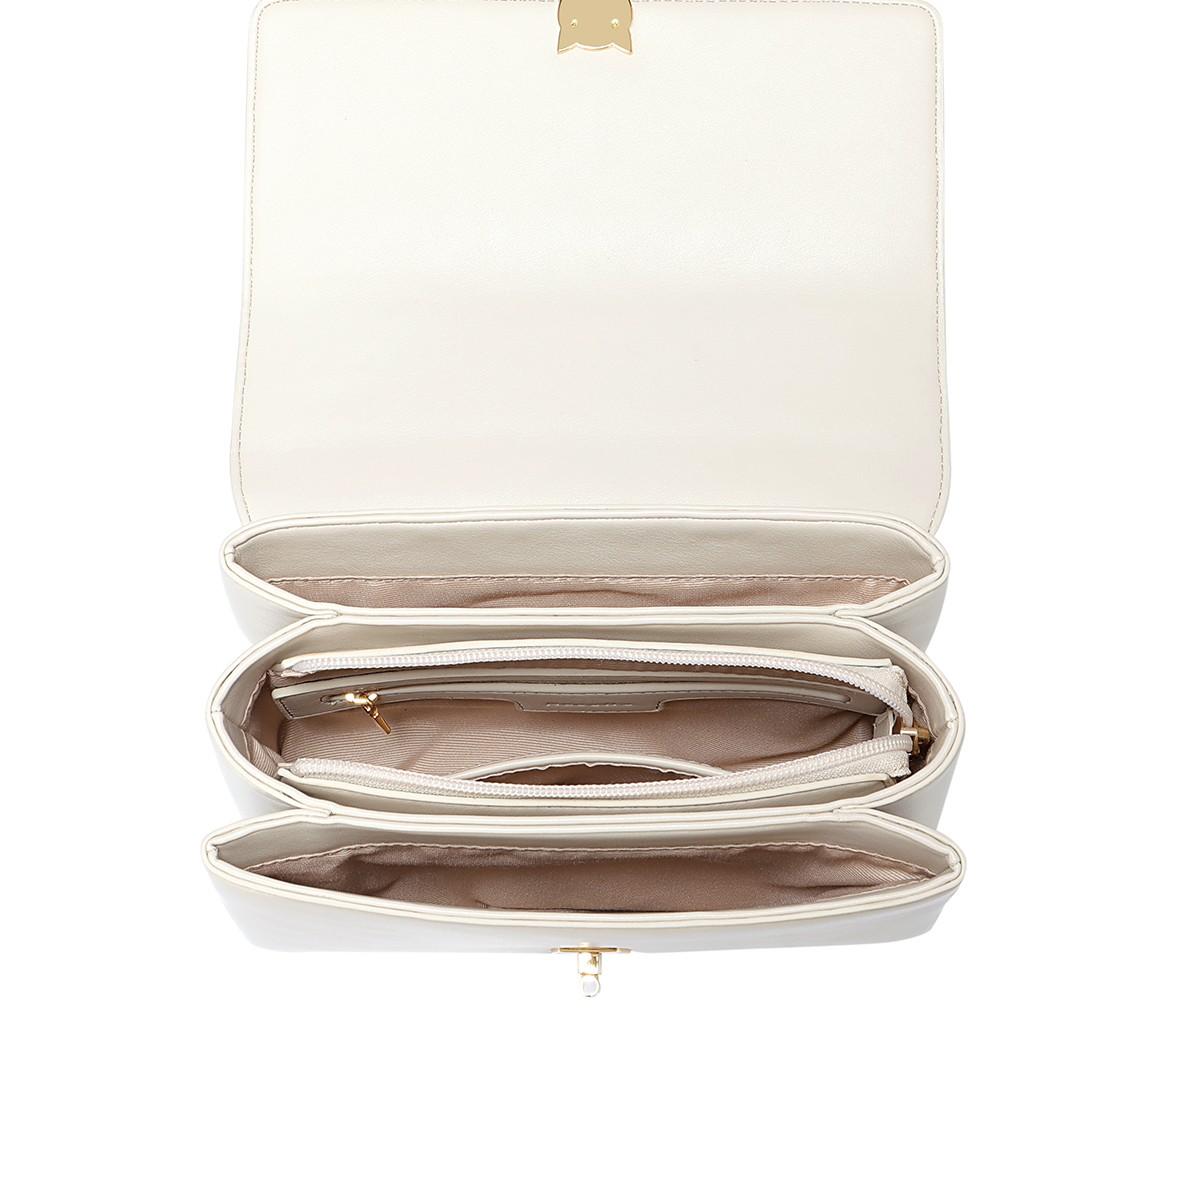 Túi nữ thời trang thiết kế Nucelle Virgo VG582